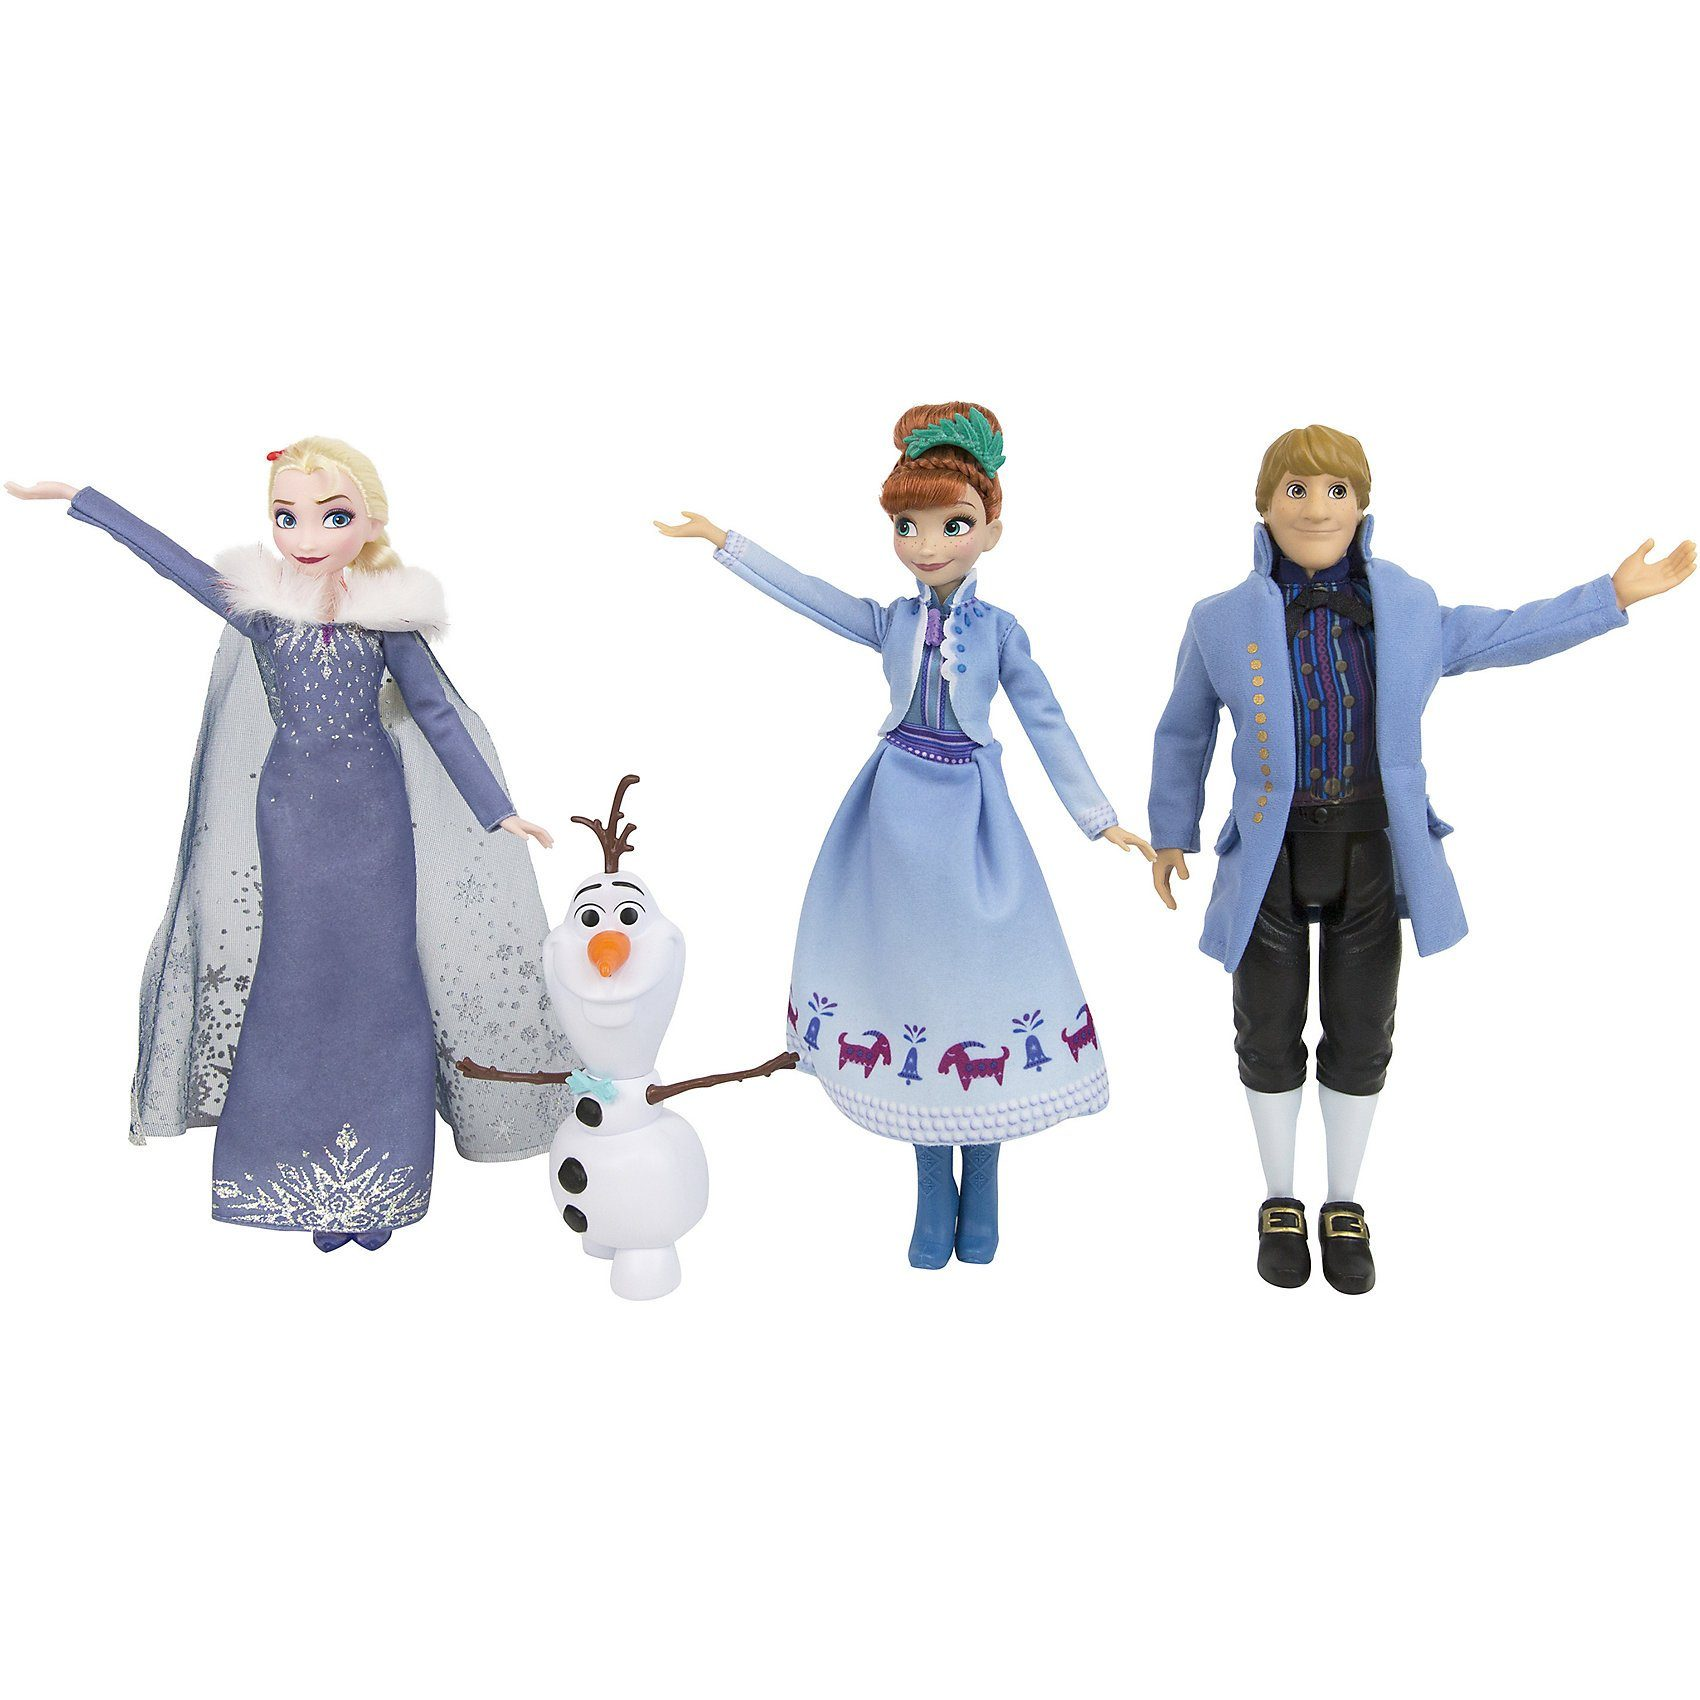 Hasbro Die Eiskönigin Olafs Holiday Adventure Wahre Freunde